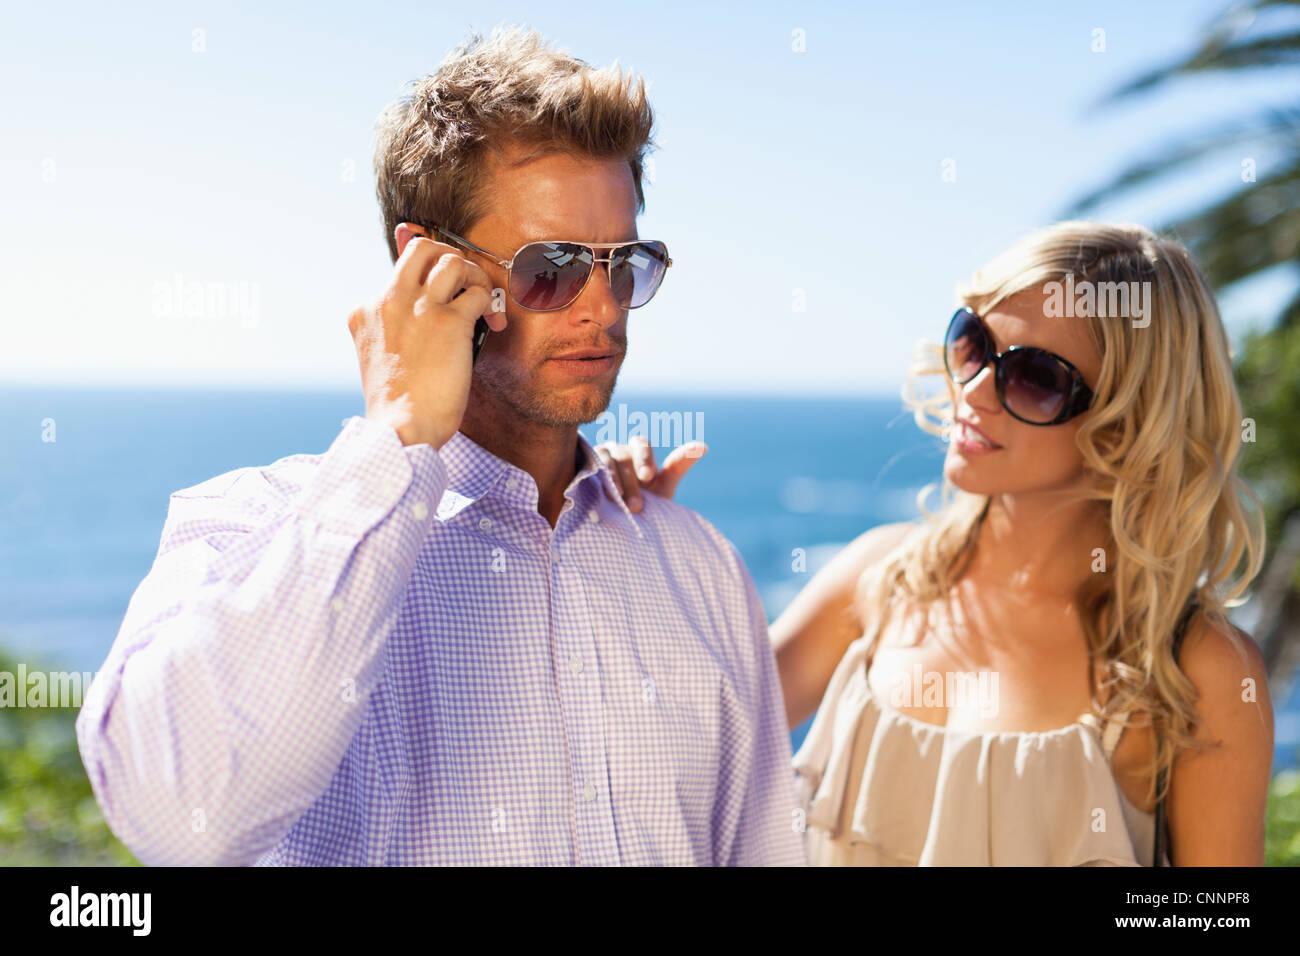 El hombre ignorando novia para teléfono celular Imagen De Stock